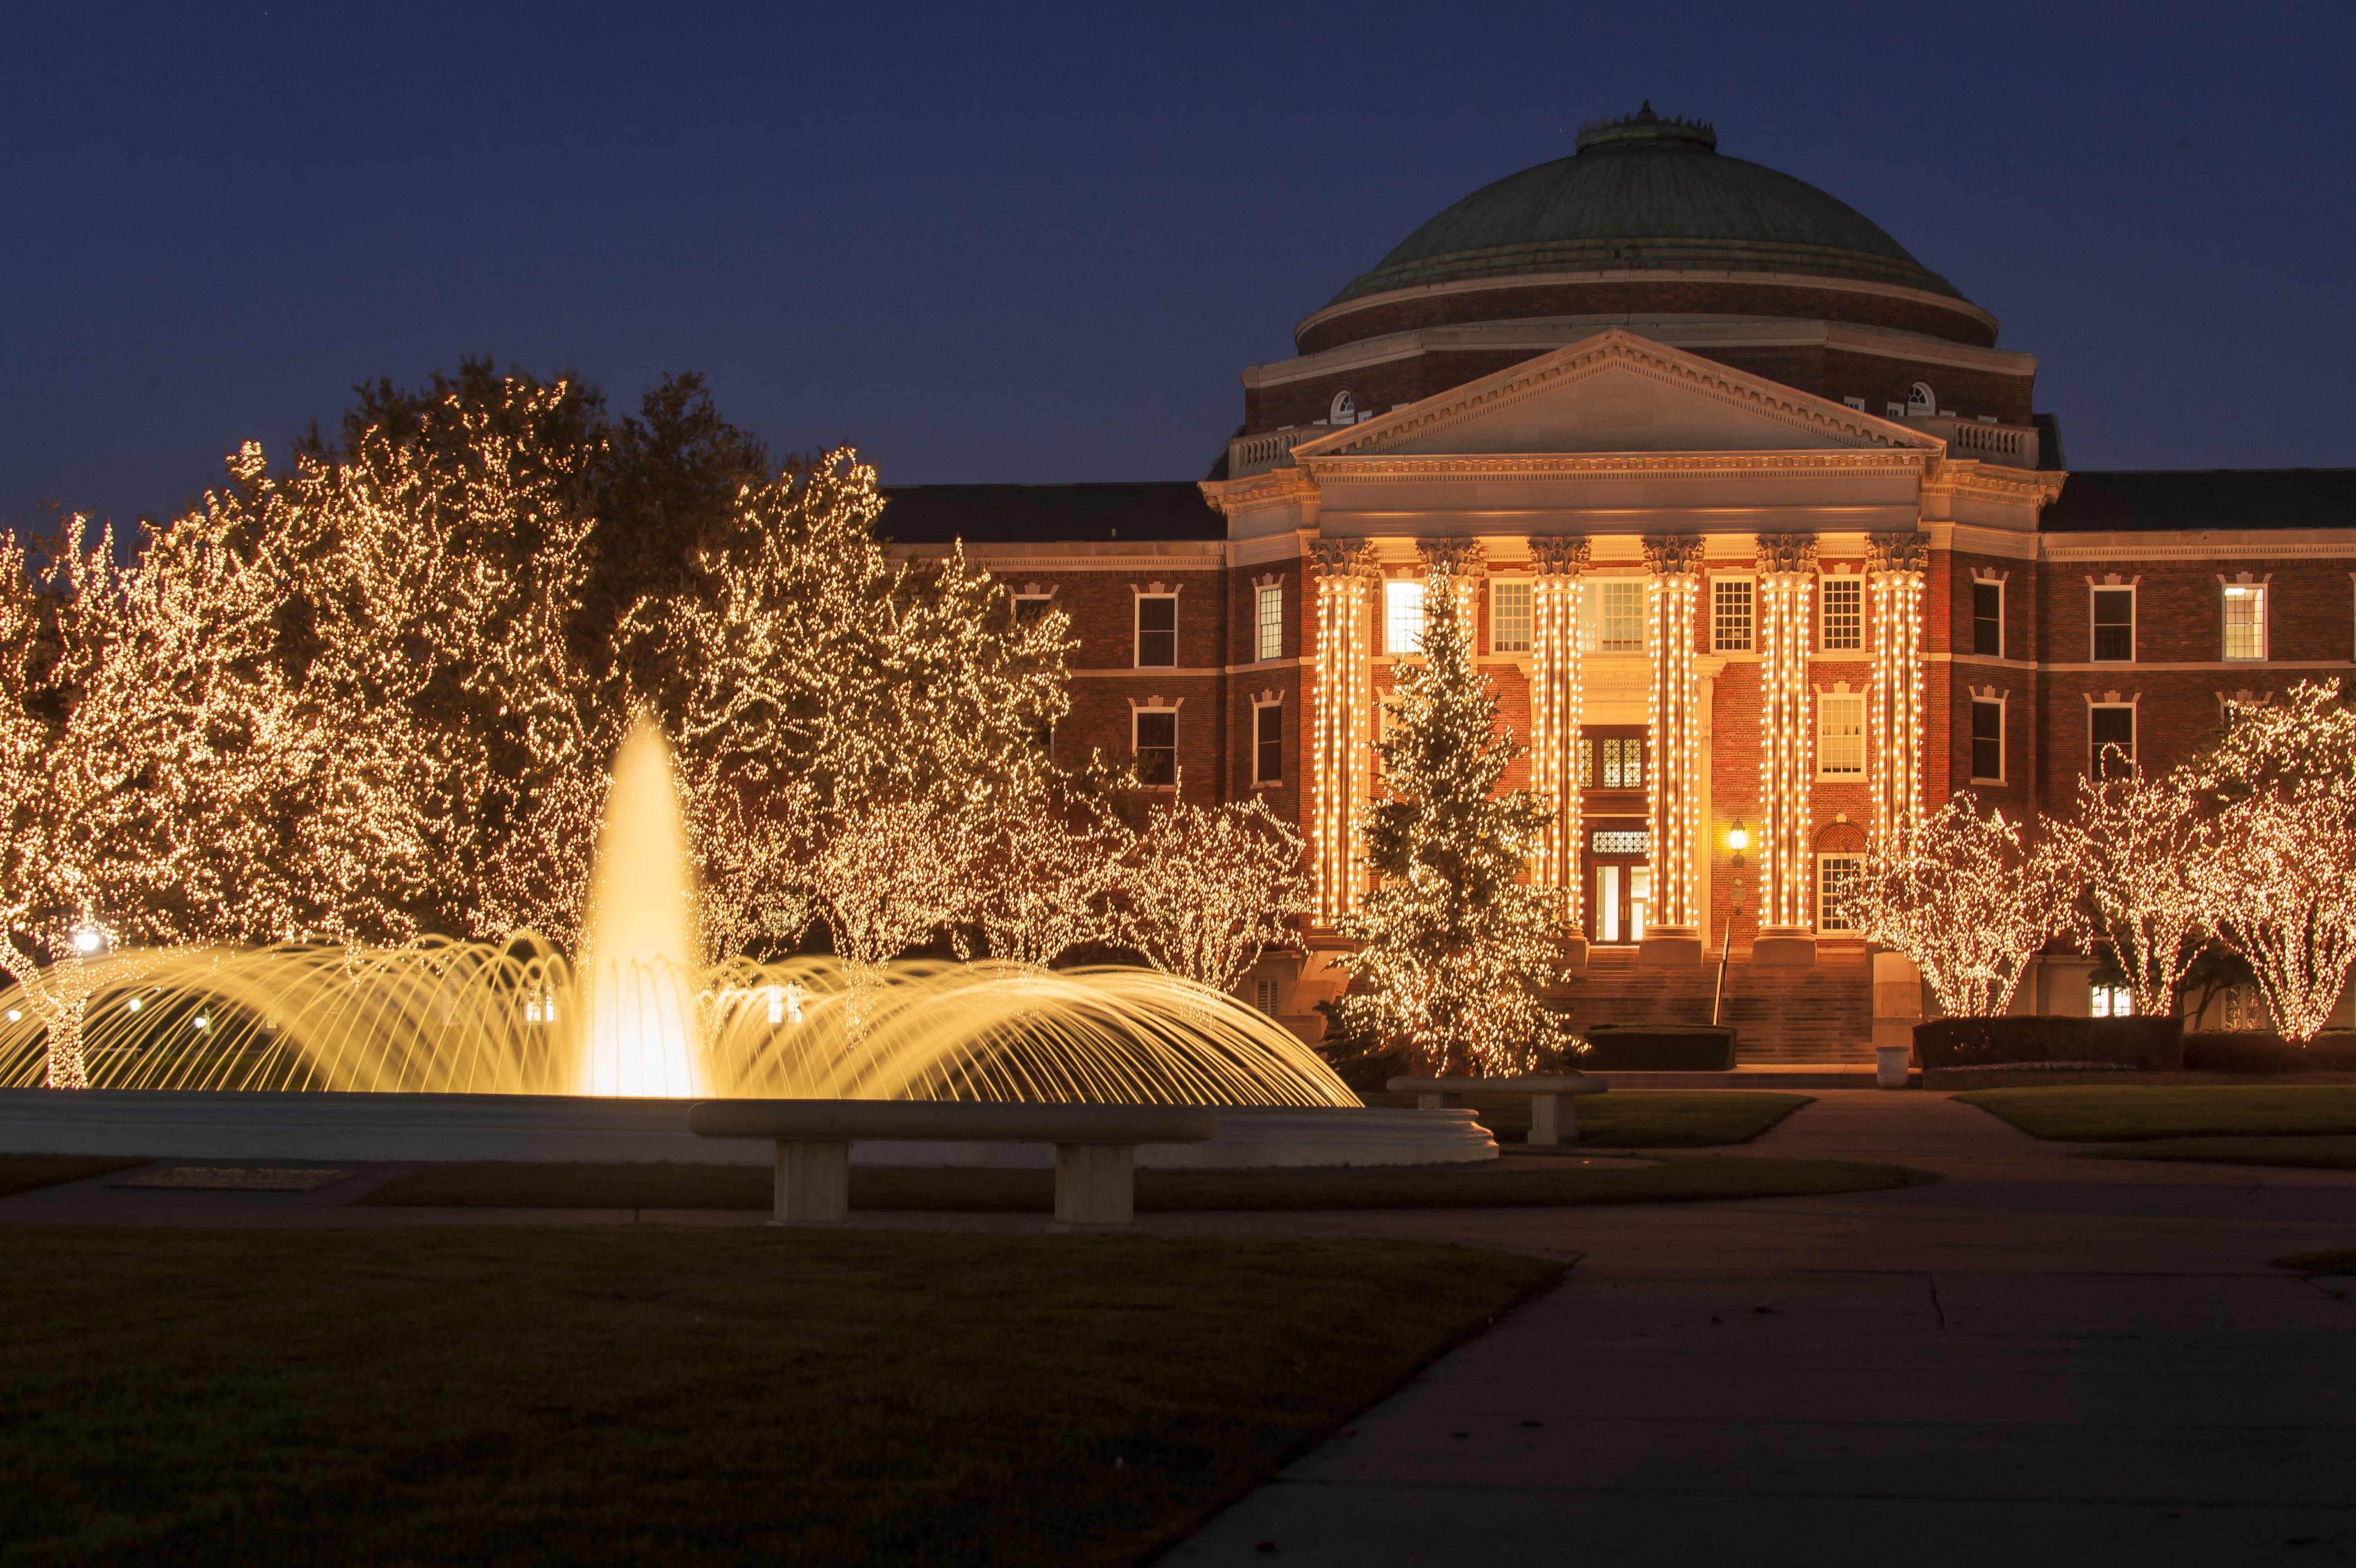 celebration of lights makes holidays bright - Celebration Christmas Lights